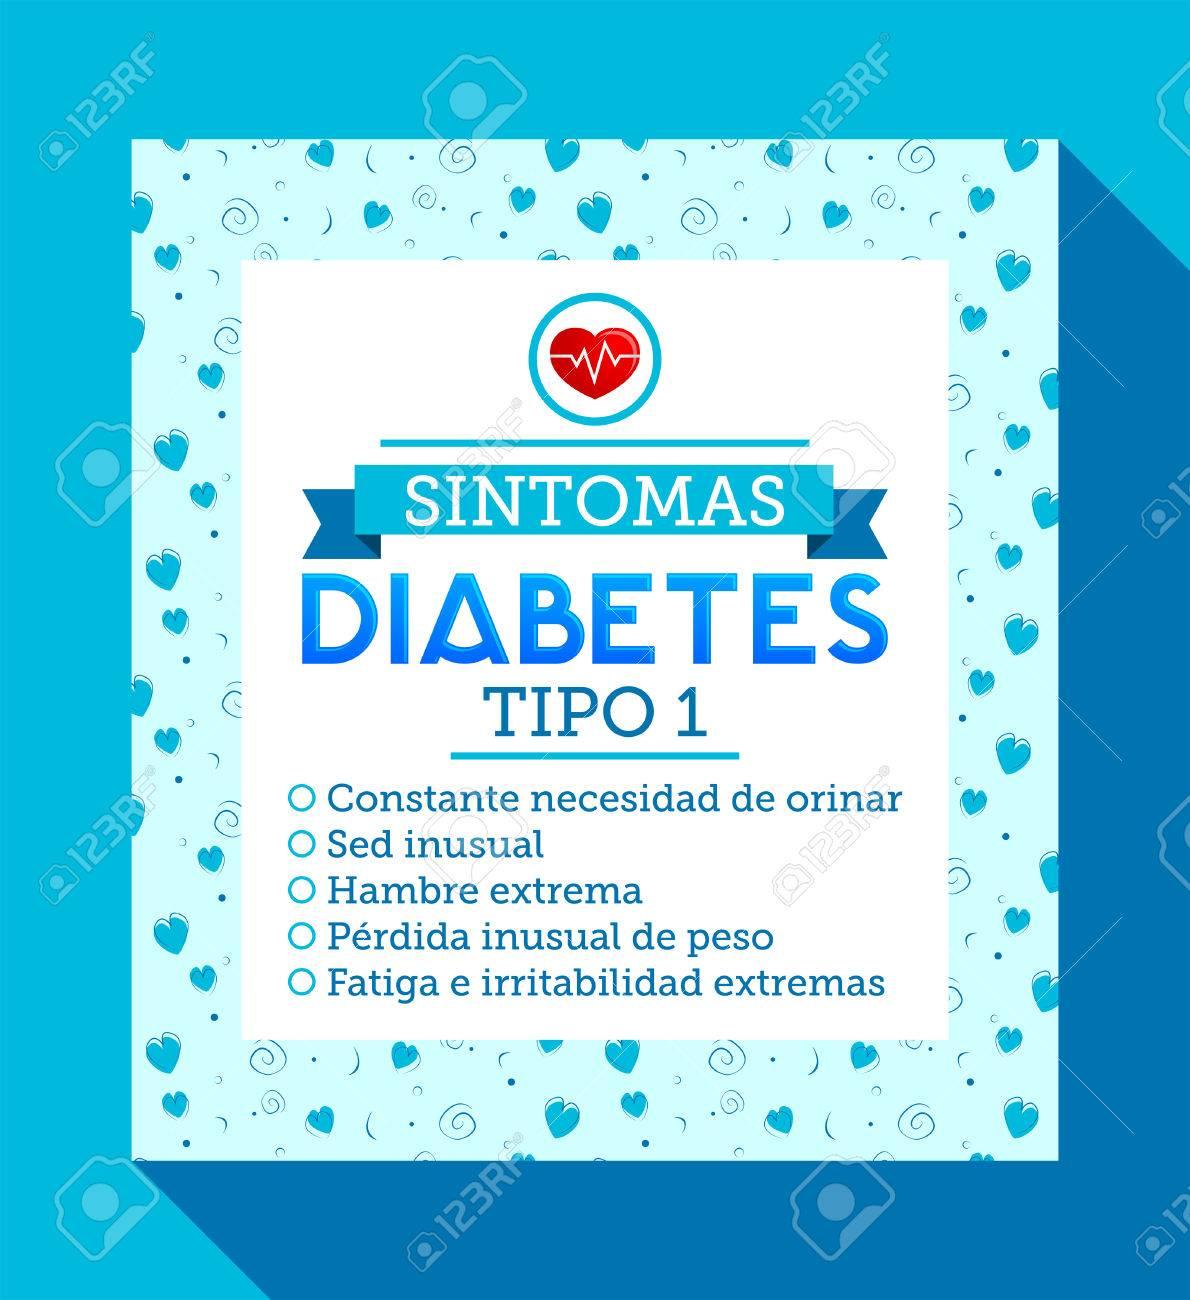 Schleichender Herzinfarkt síntomas de diabetes